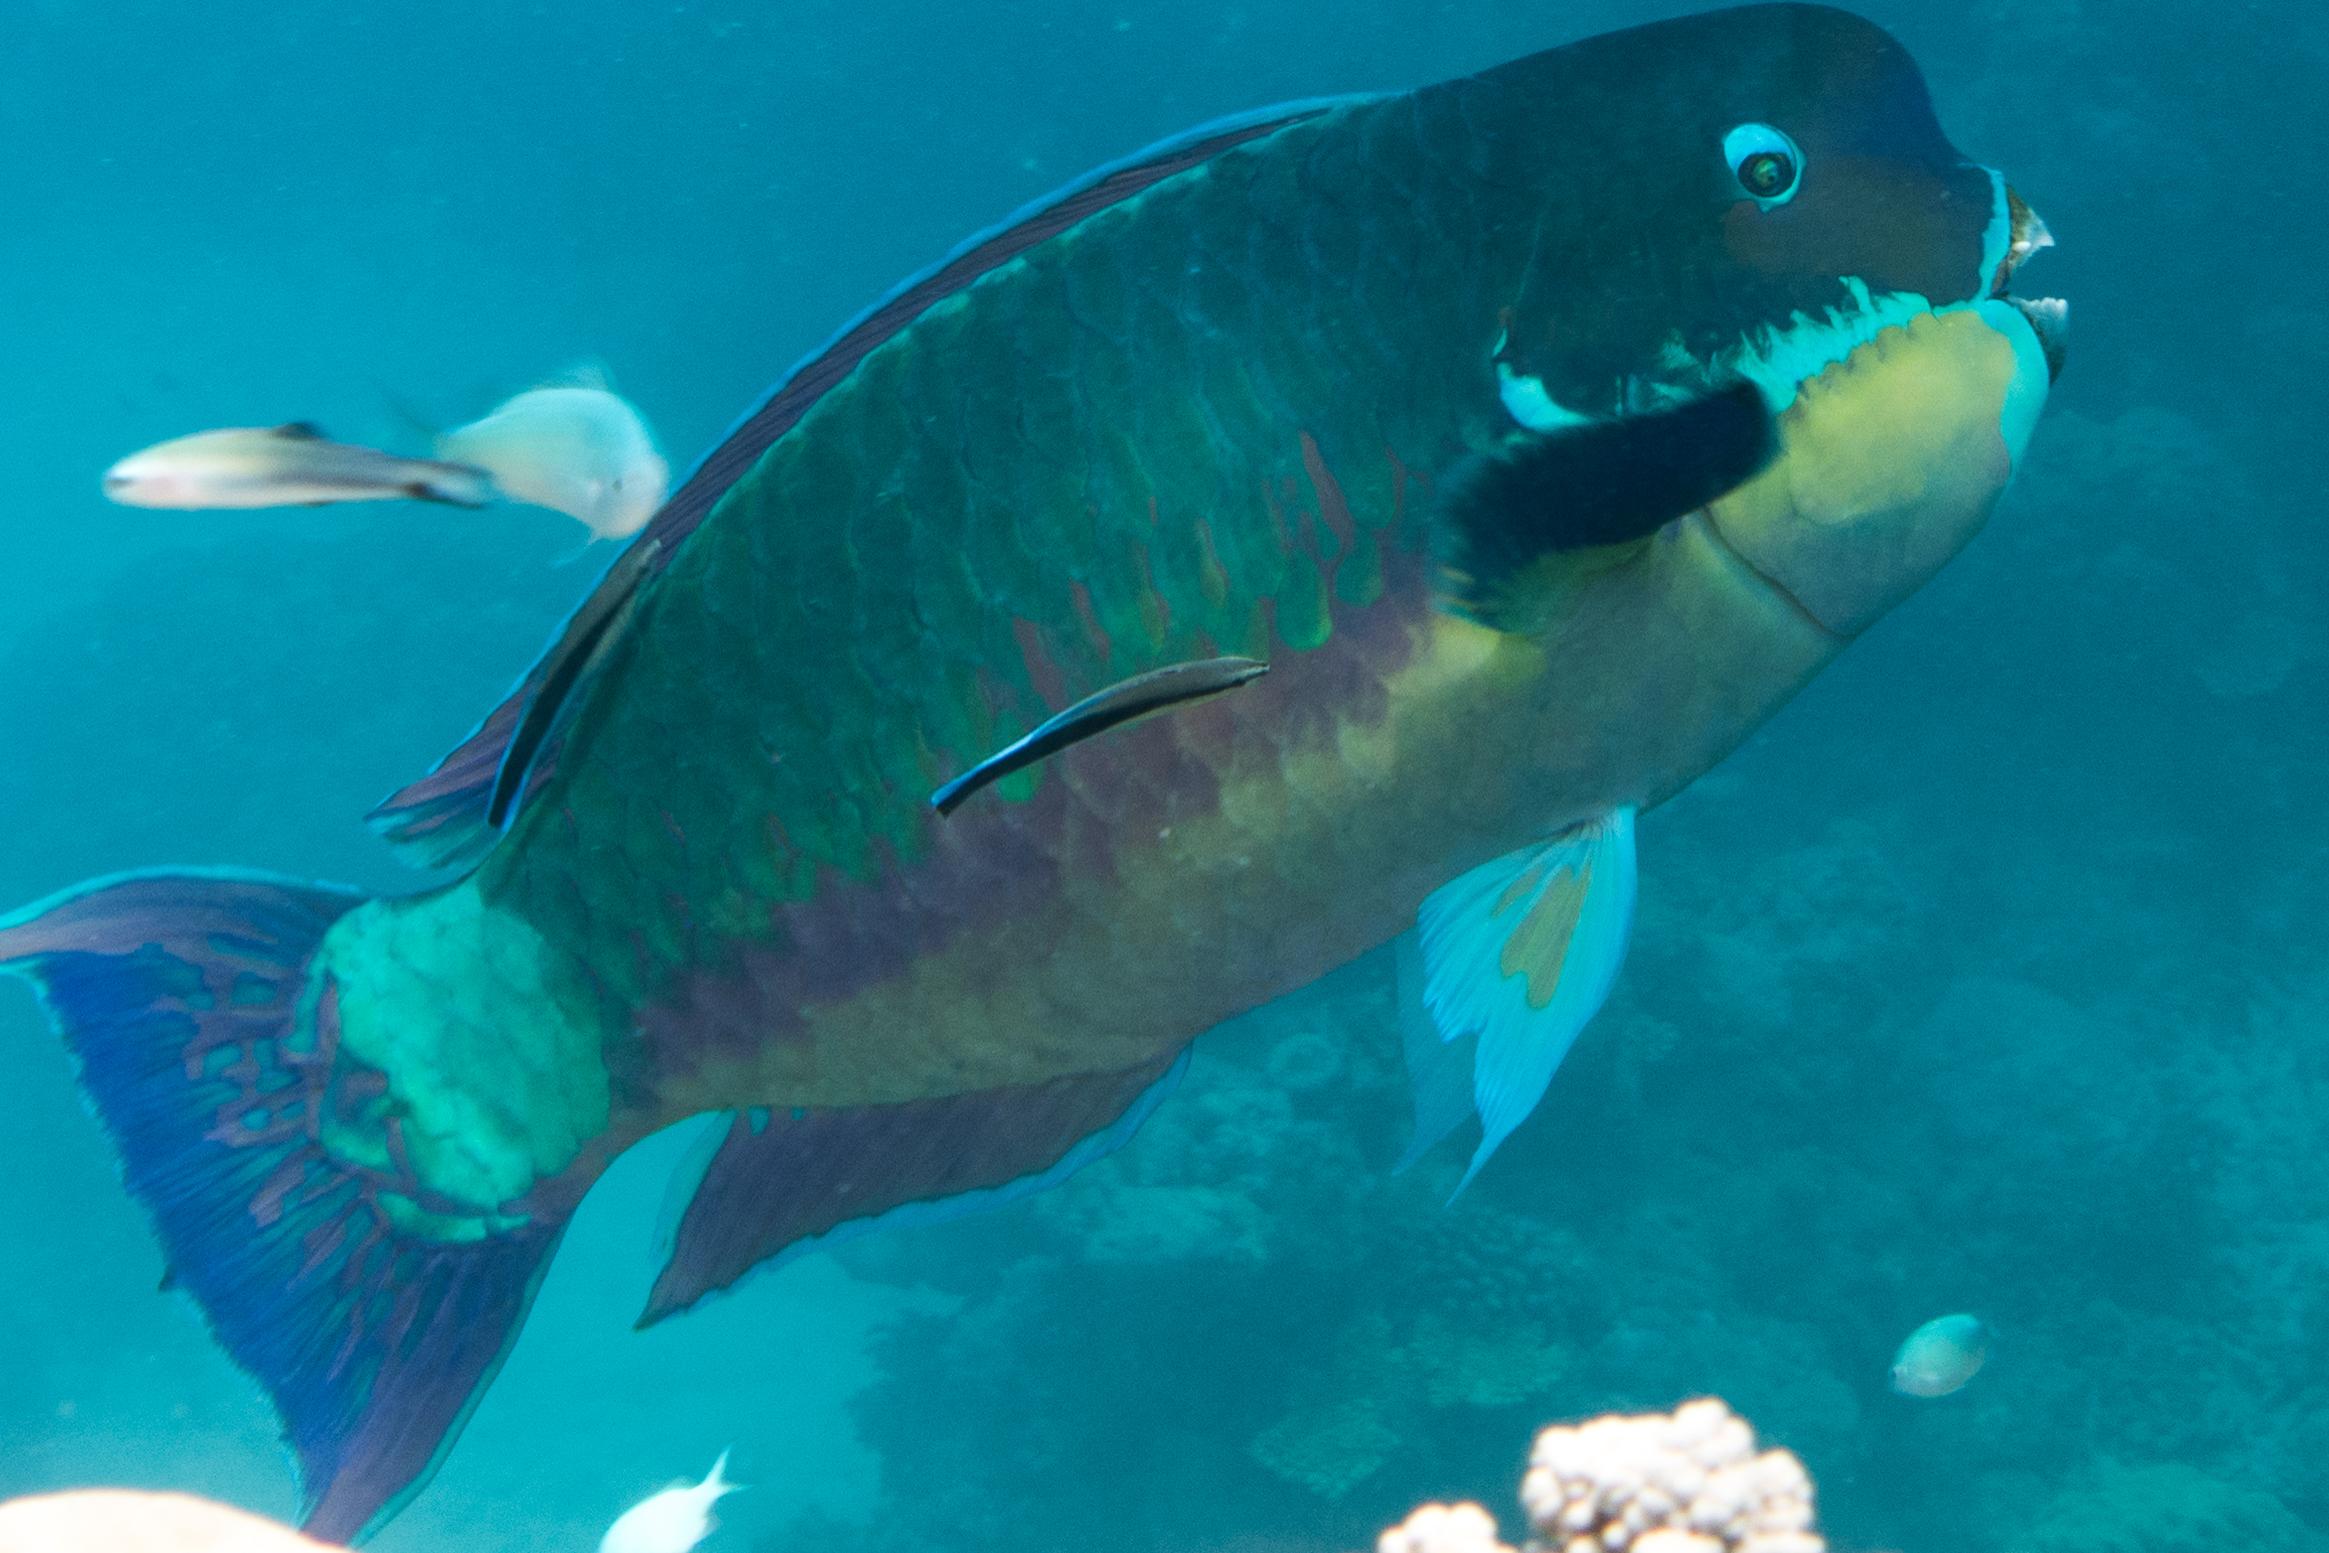 Male Parrotfish